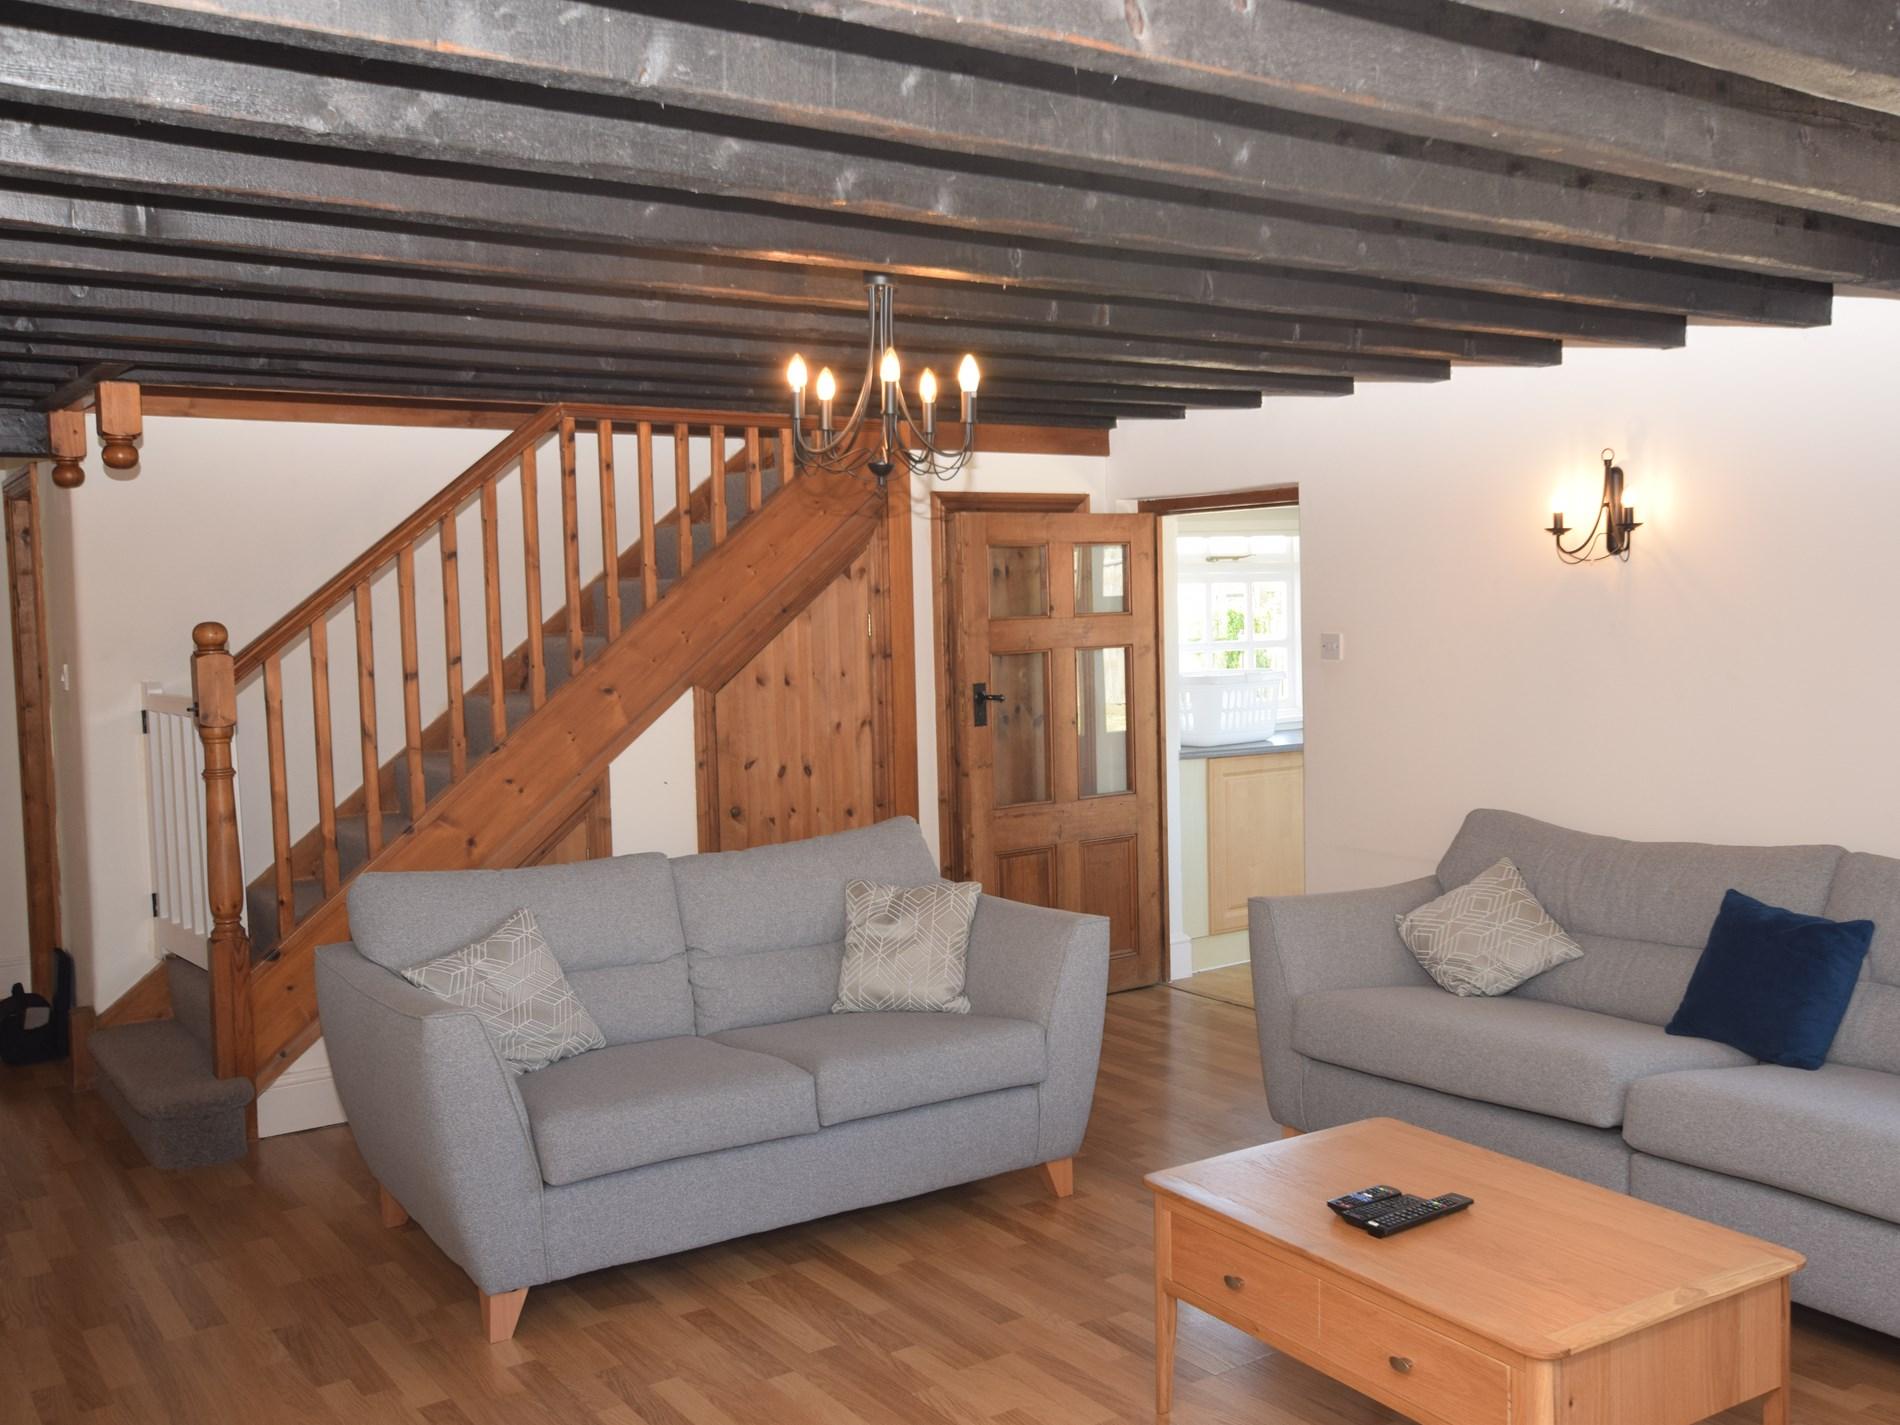 6 Bedroom House in North Cornwall, Cornwall